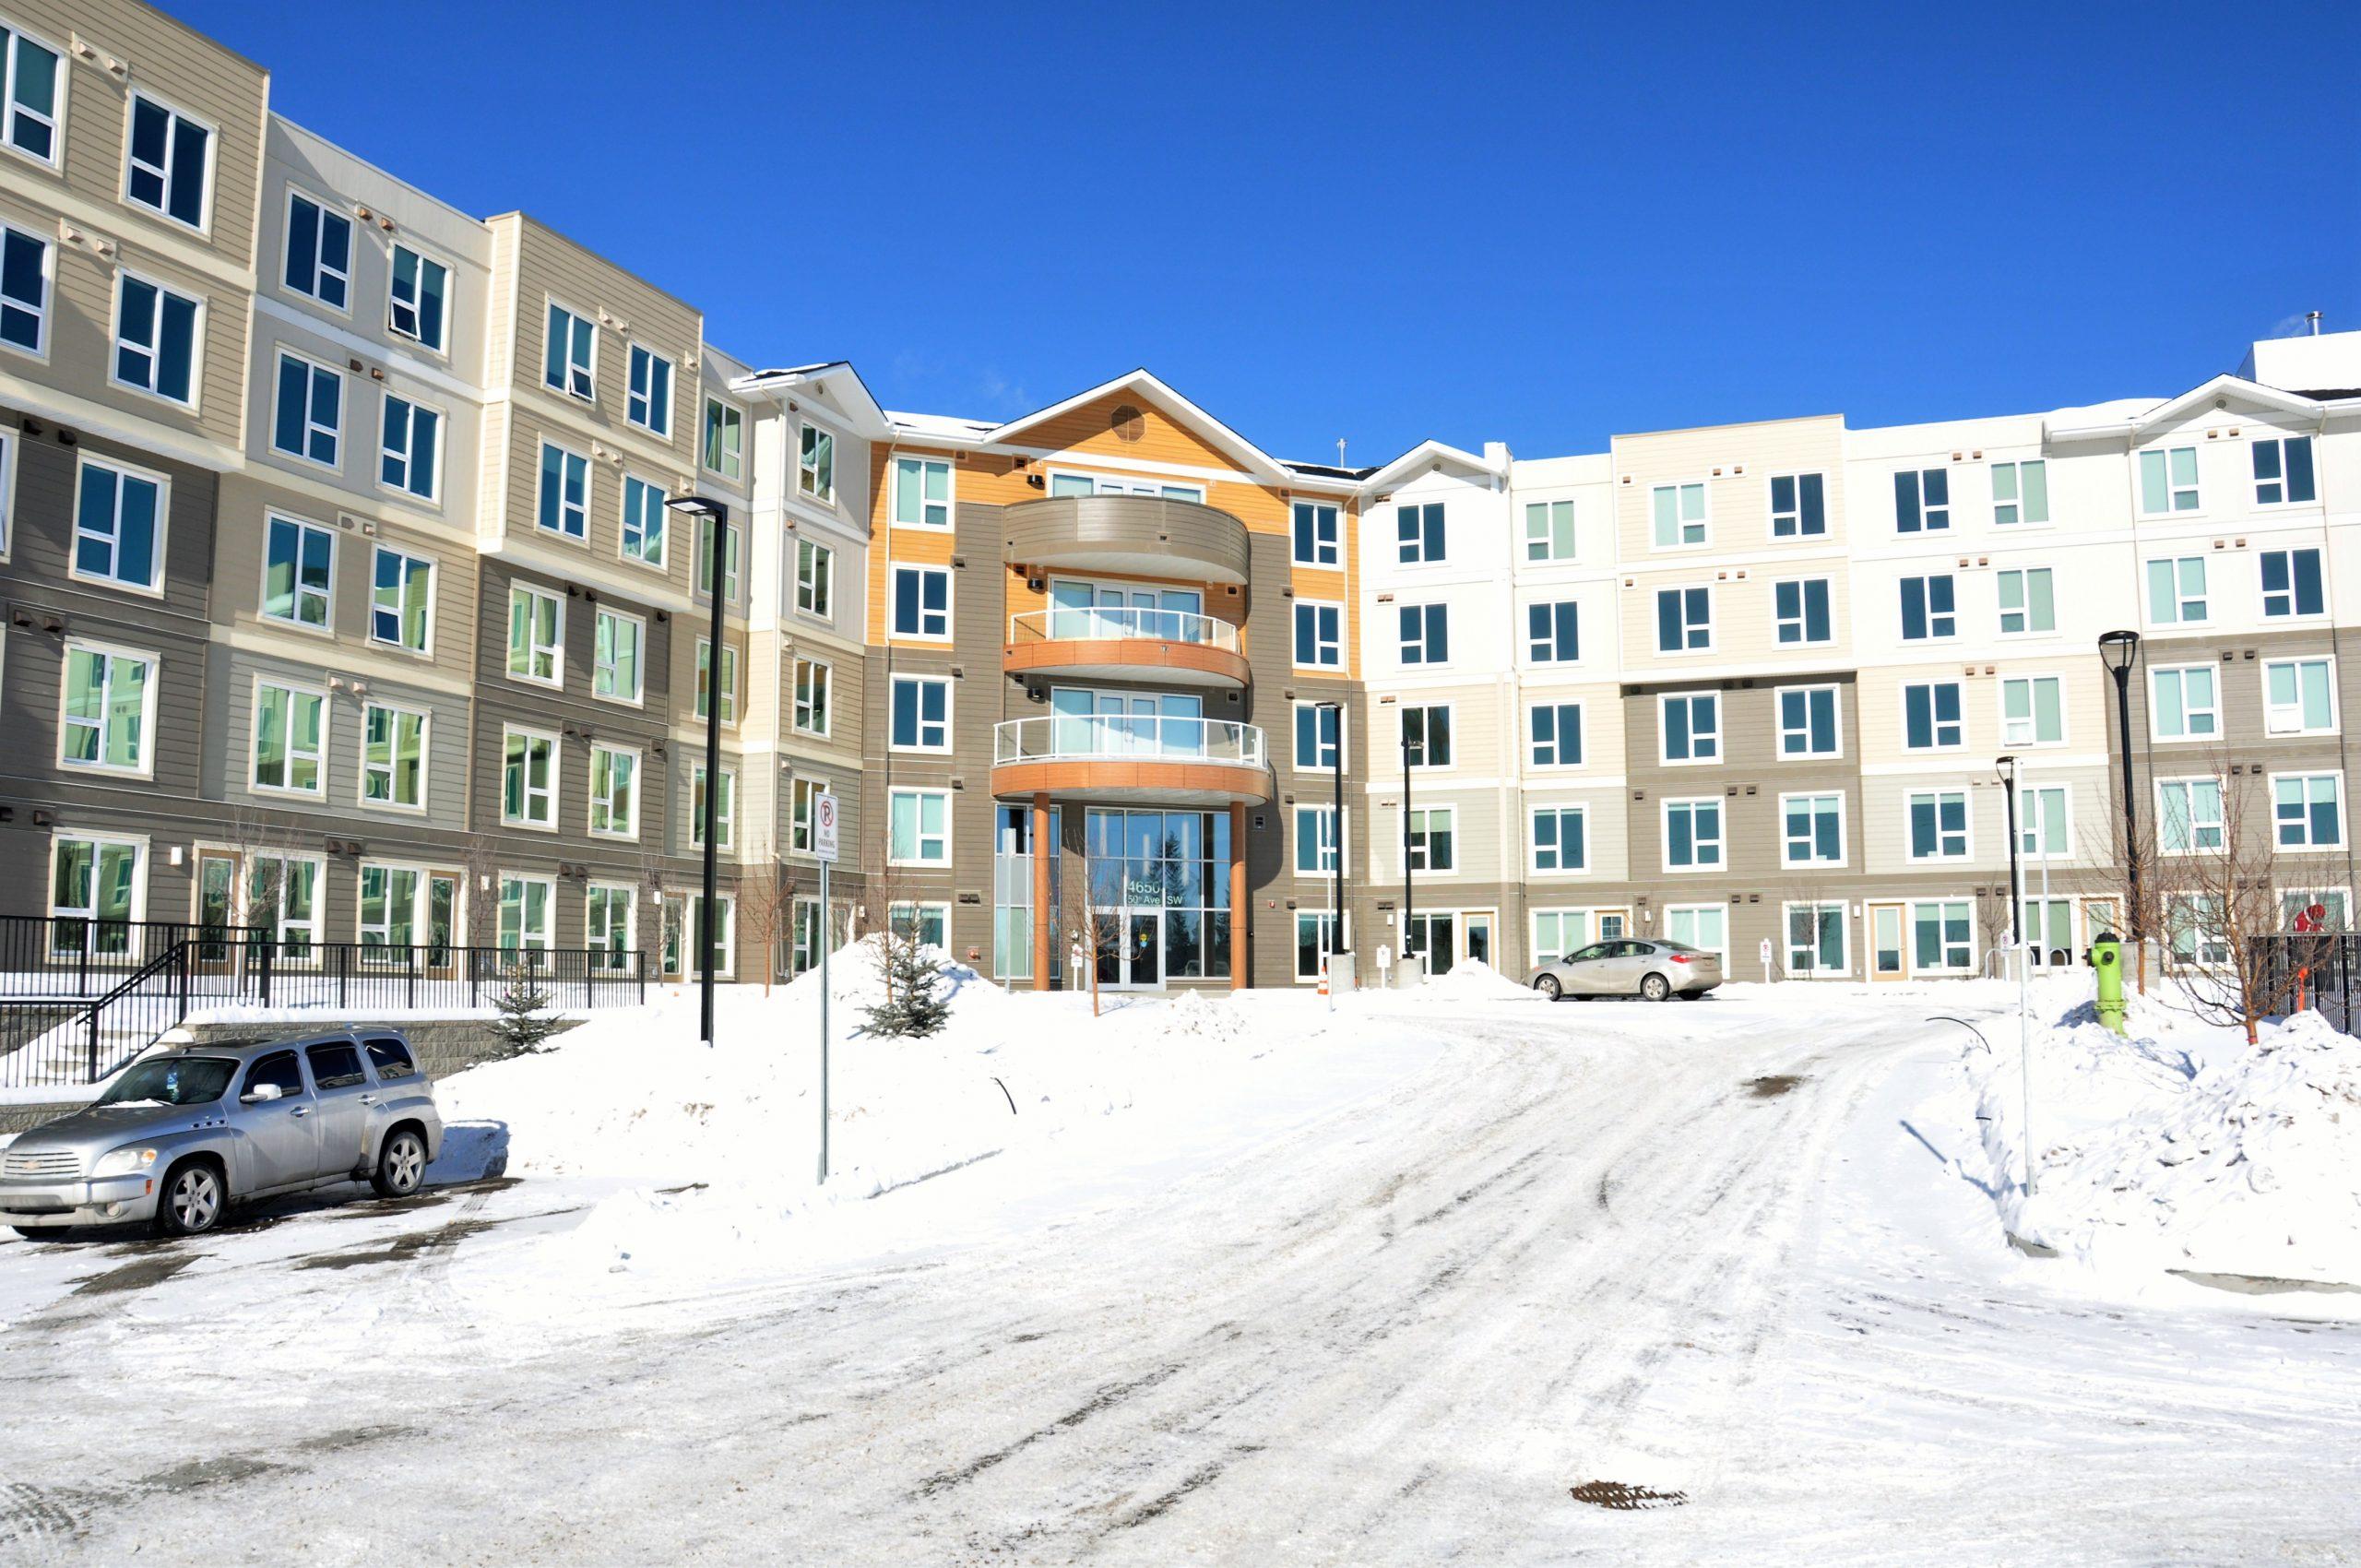 Horizon View Building